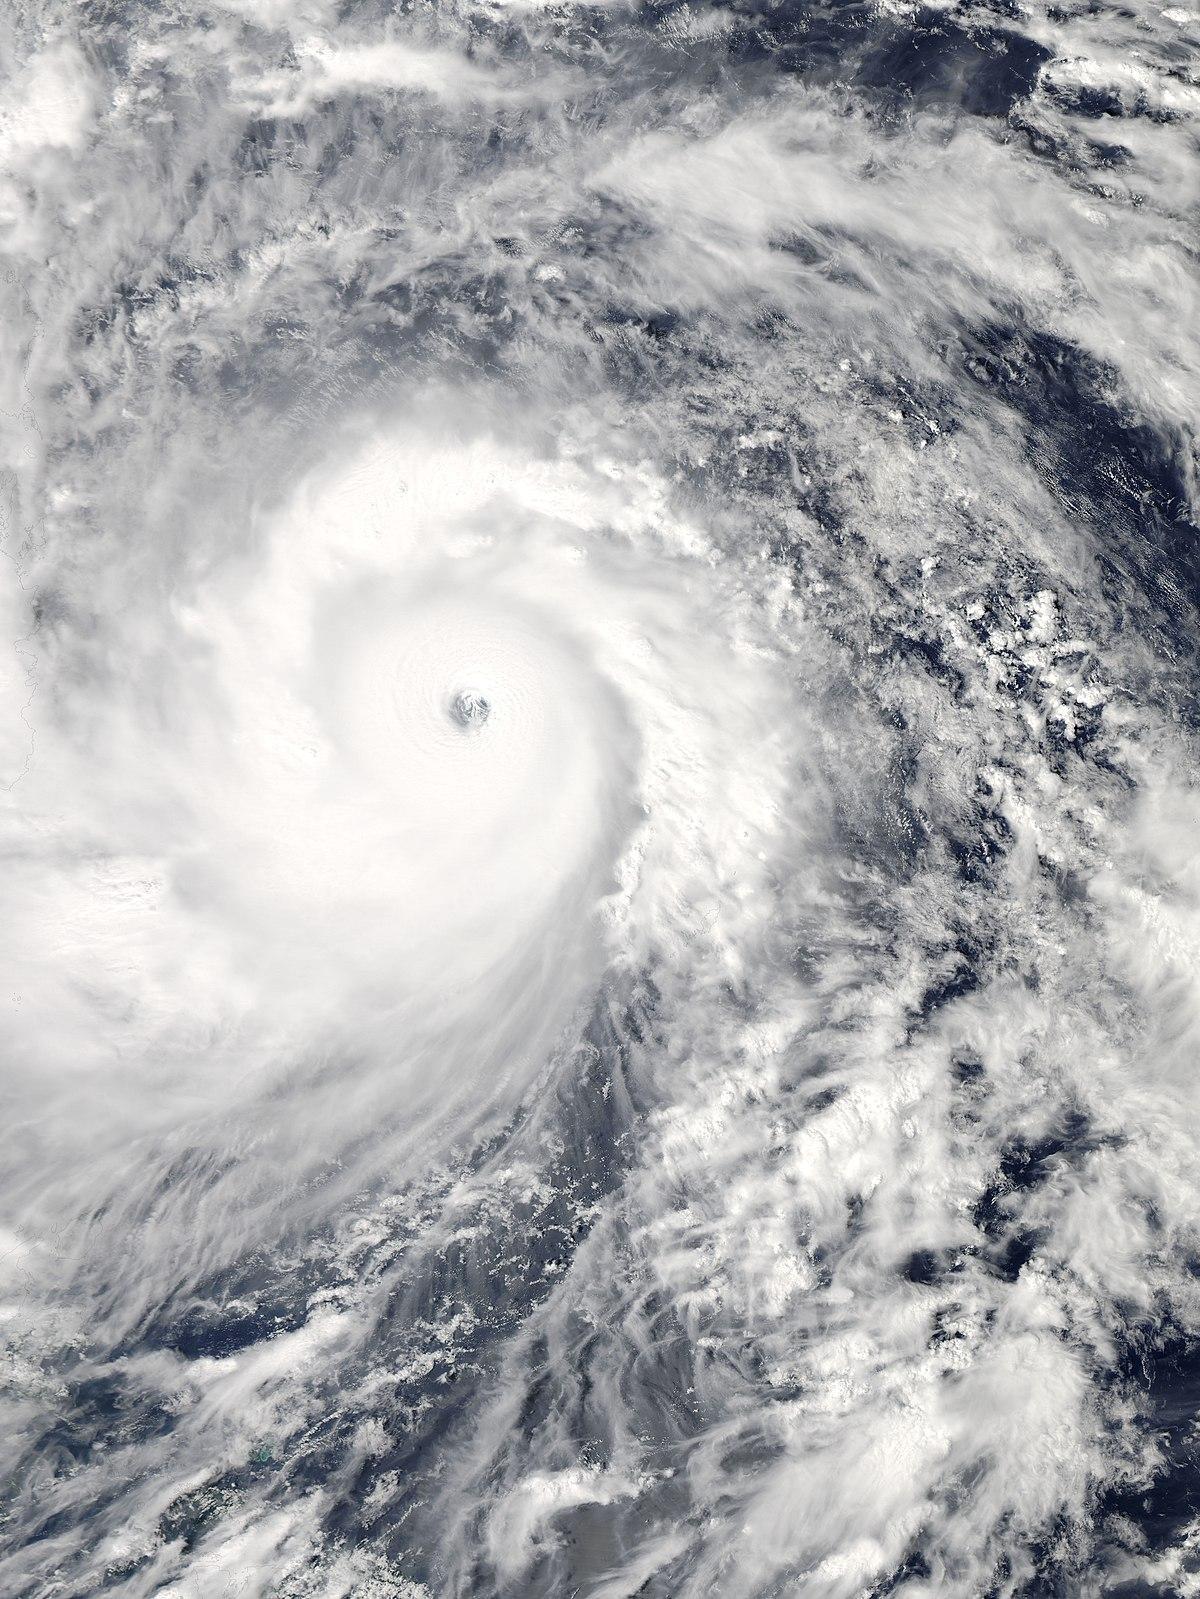 Badai Haiyan Angin Topan Kekeringan Dan Banjir Merupakan Contoh Bencana : badai, haiyan, angin, topan, kekeringan, banjir, merupakan, contoh, bencana, Topan, Haiyan, Wikipedia, Bahasa, Indonesia,, Ensiklopedia, Bebas